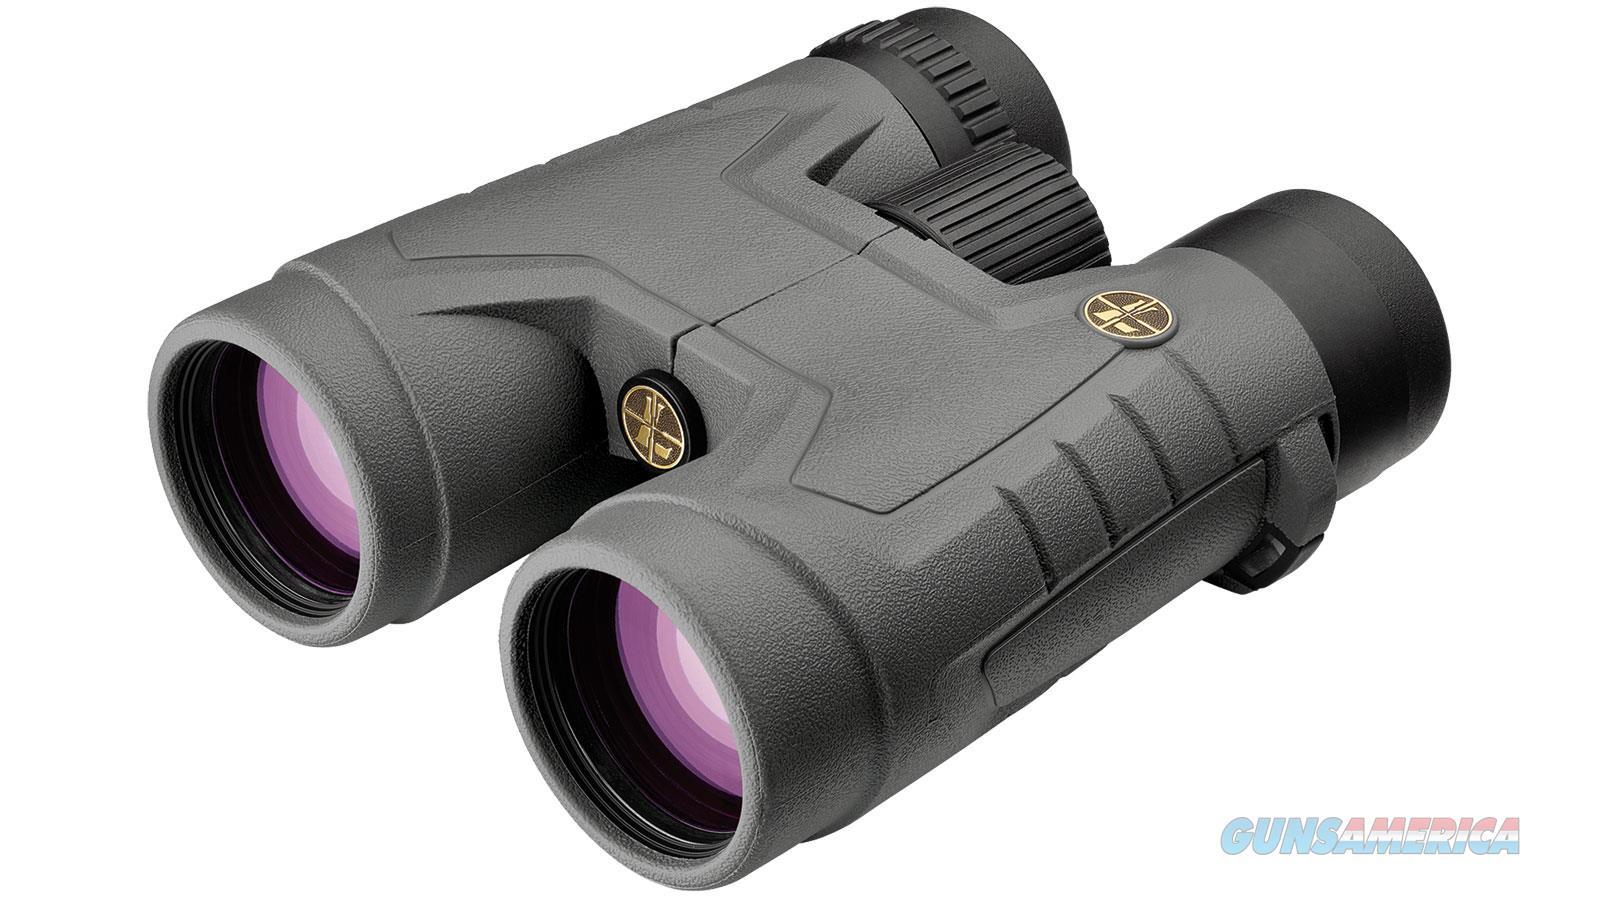 Leupold Bx-2 Acadia 10X42mm Roof 172700  Non-Guns > Scopes/Mounts/Rings & Optics > Non-Scope Optics > Binoculars